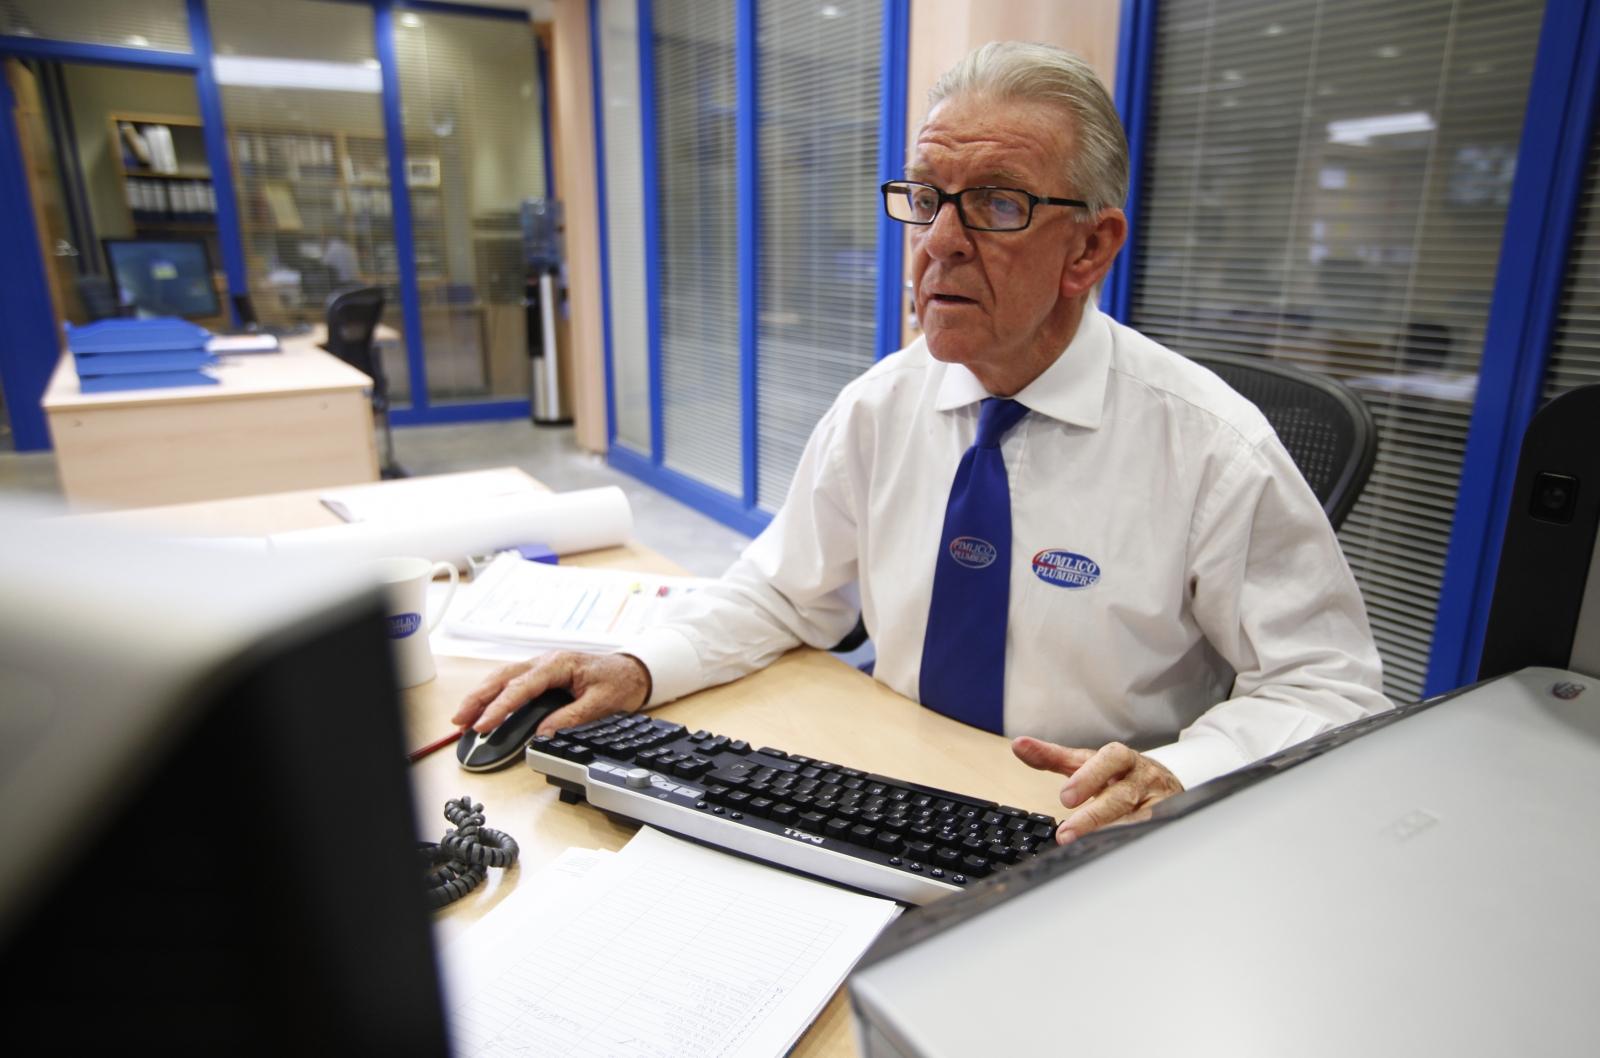 Old worker UK